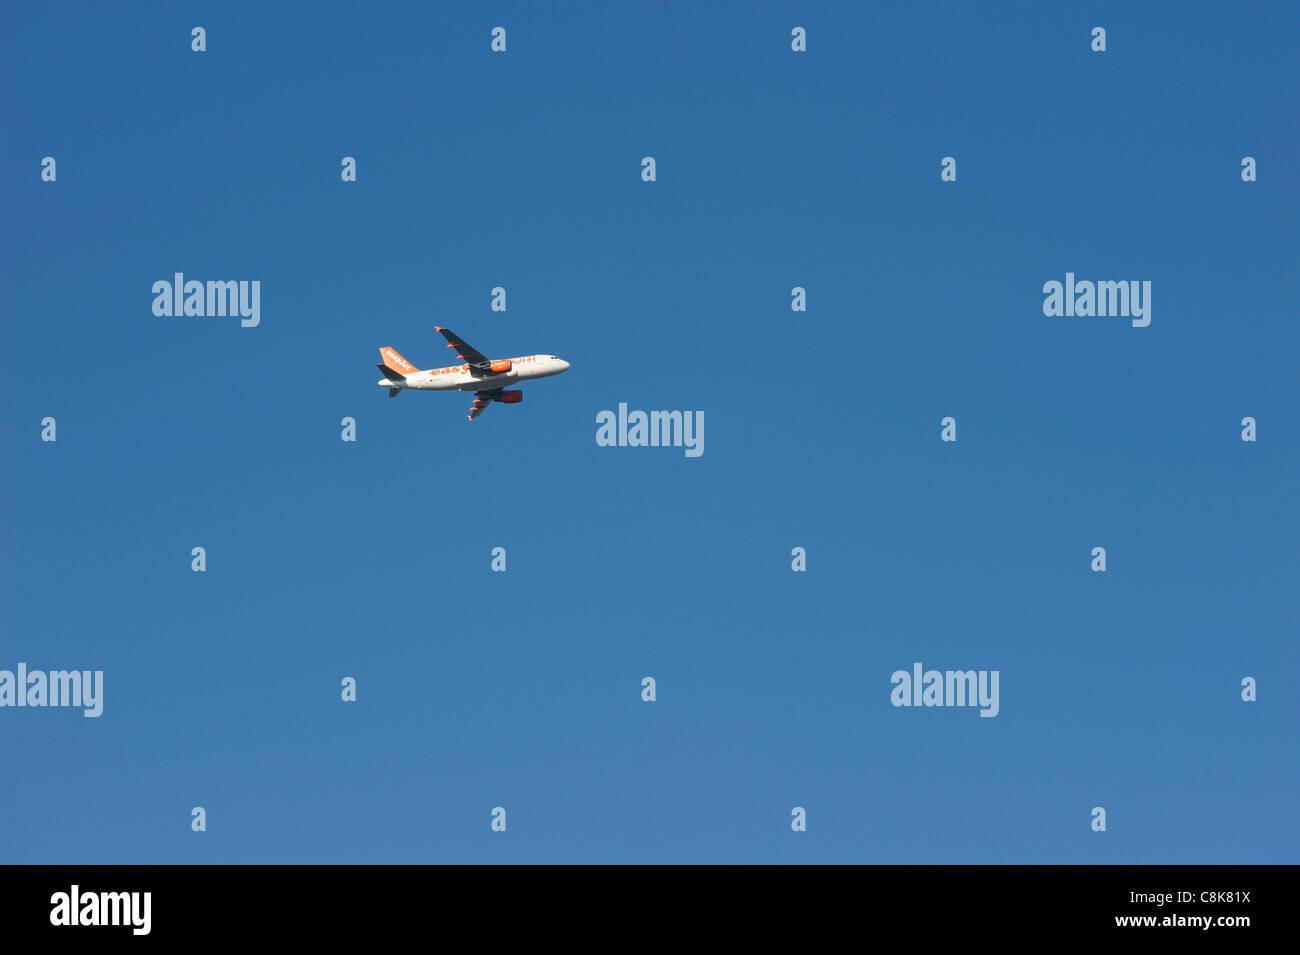 Easyjet plane - Stock Image